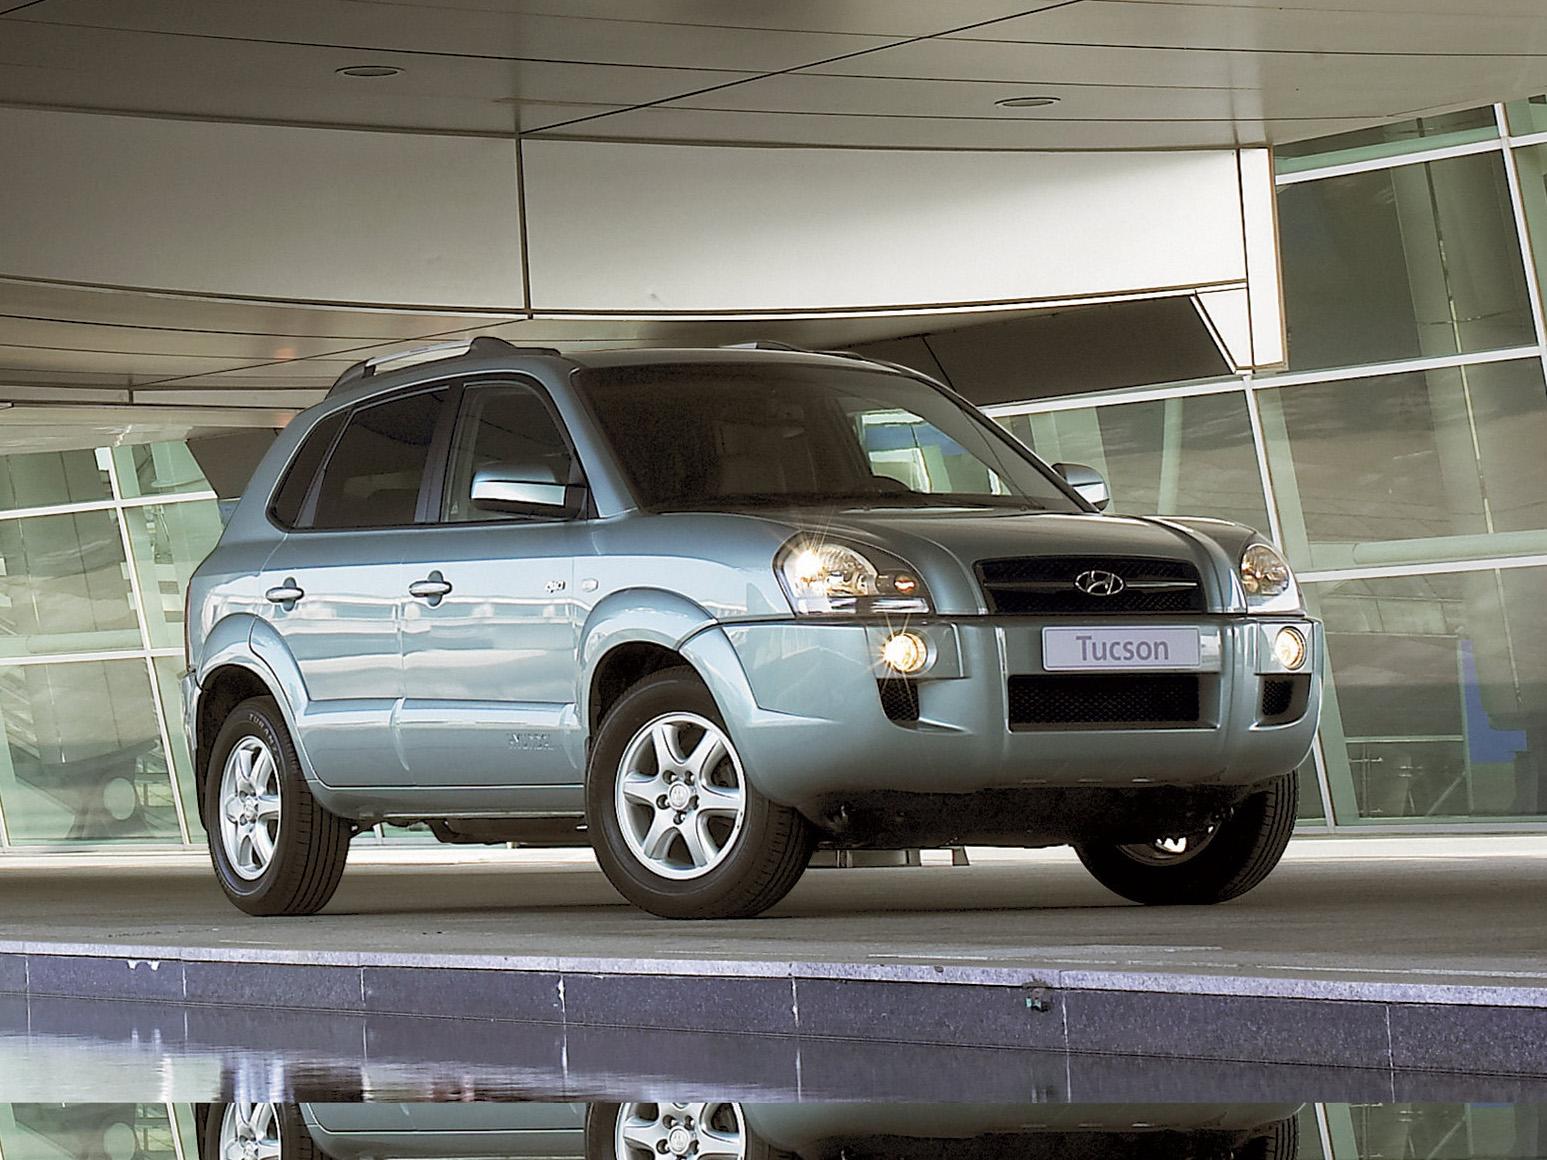 Фотографии Hyundai Tucson на сайте Автомобили мира.